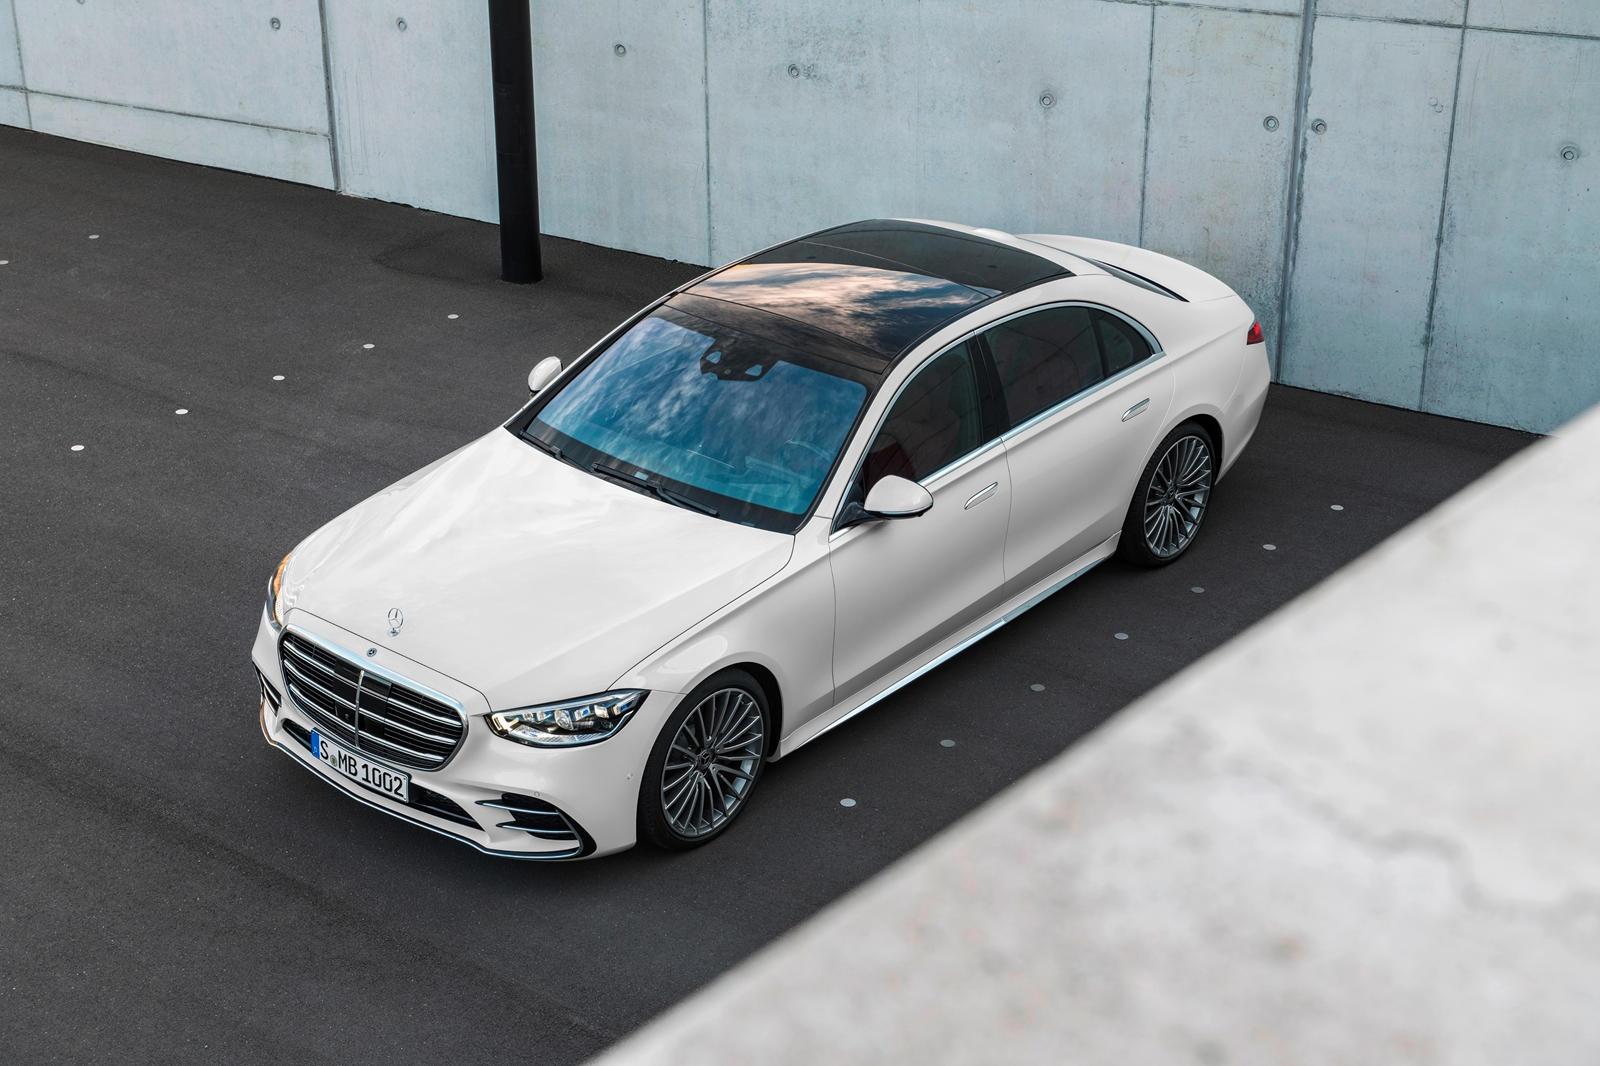 danh gia Mercedes-Benz S-Class 2021 anh 4